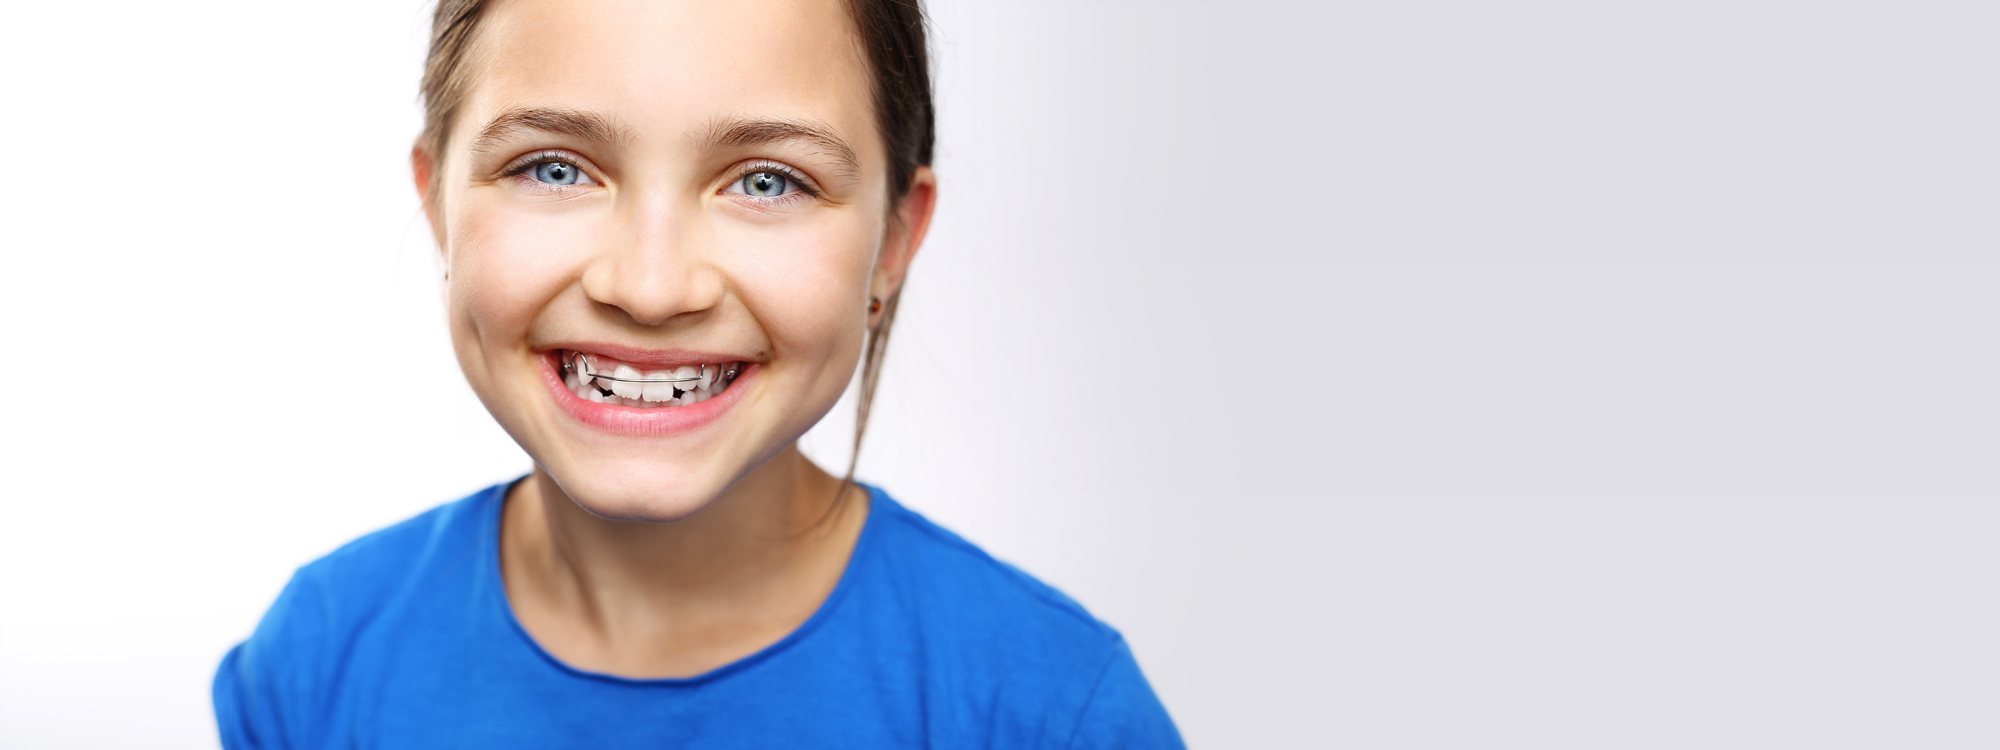 Orthodontie - Mondzorg Zichem